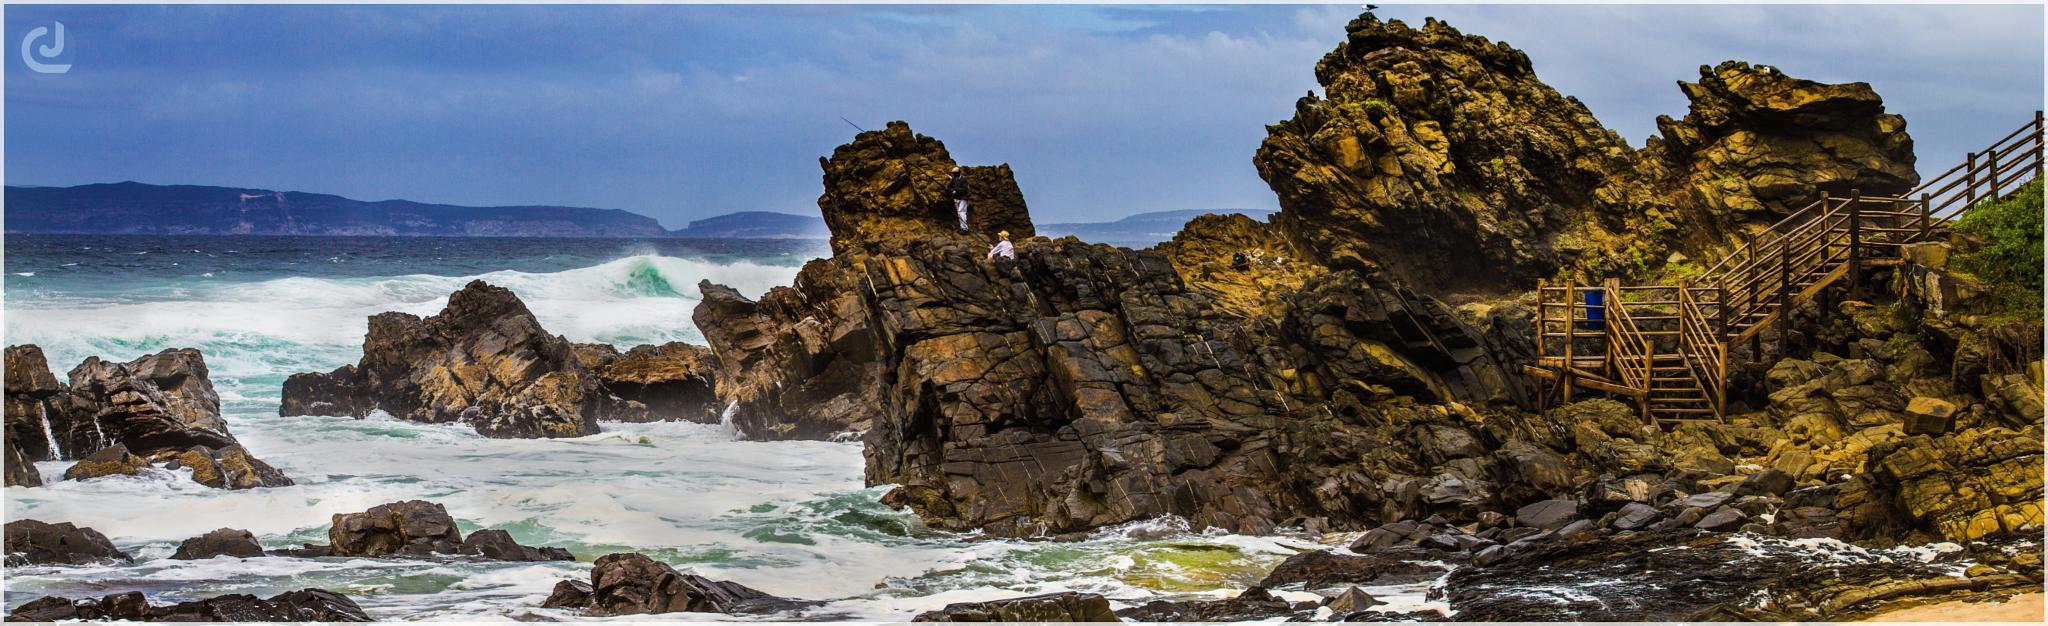 Photo in Landscape #plettenberg bay #eastern cape #south africa